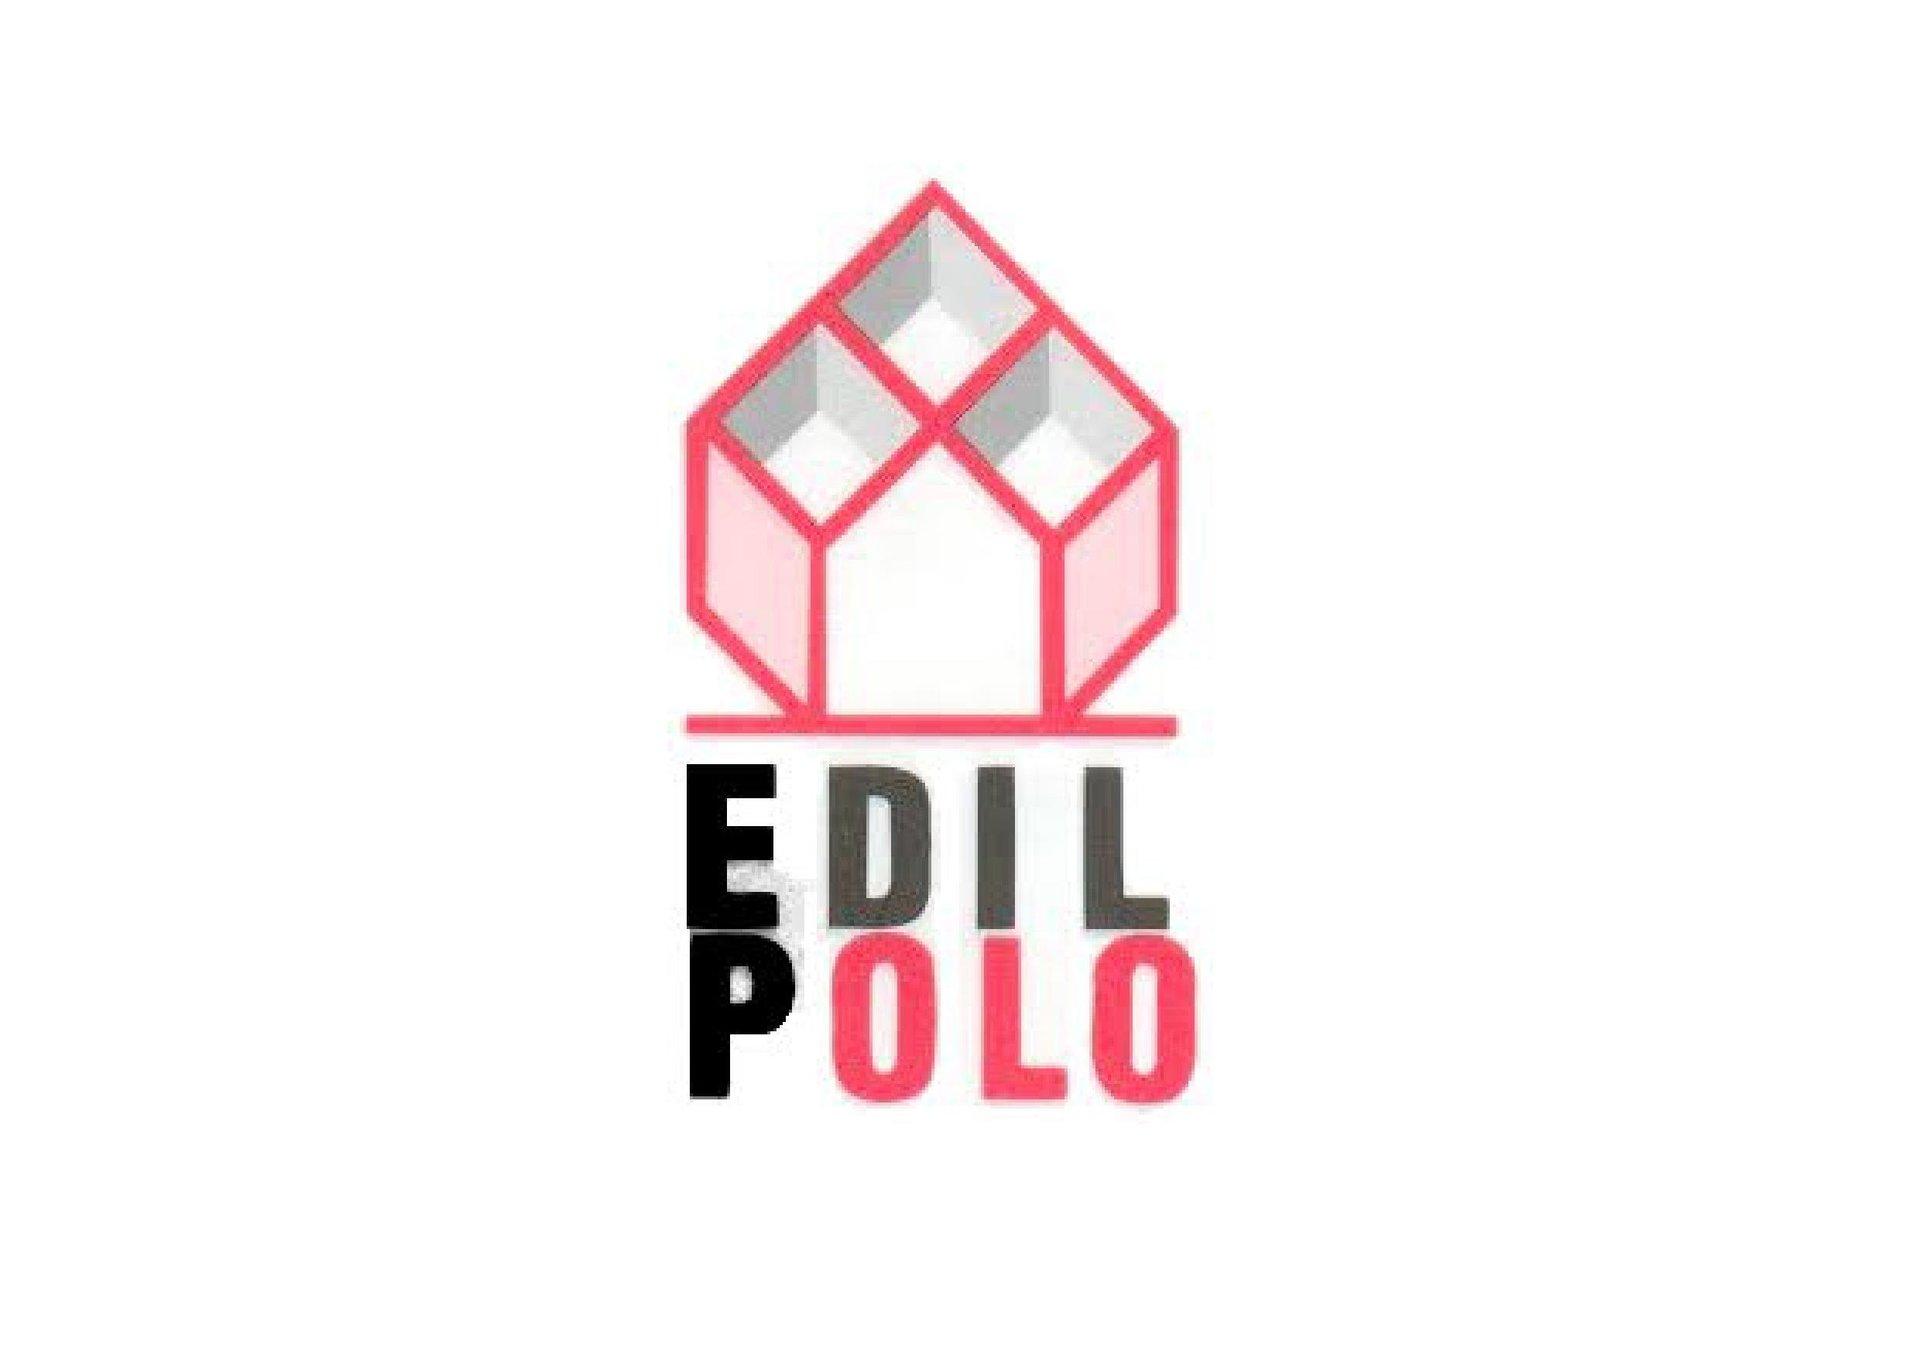 EDILPOLO MATERIALI EDILI srl - Logo